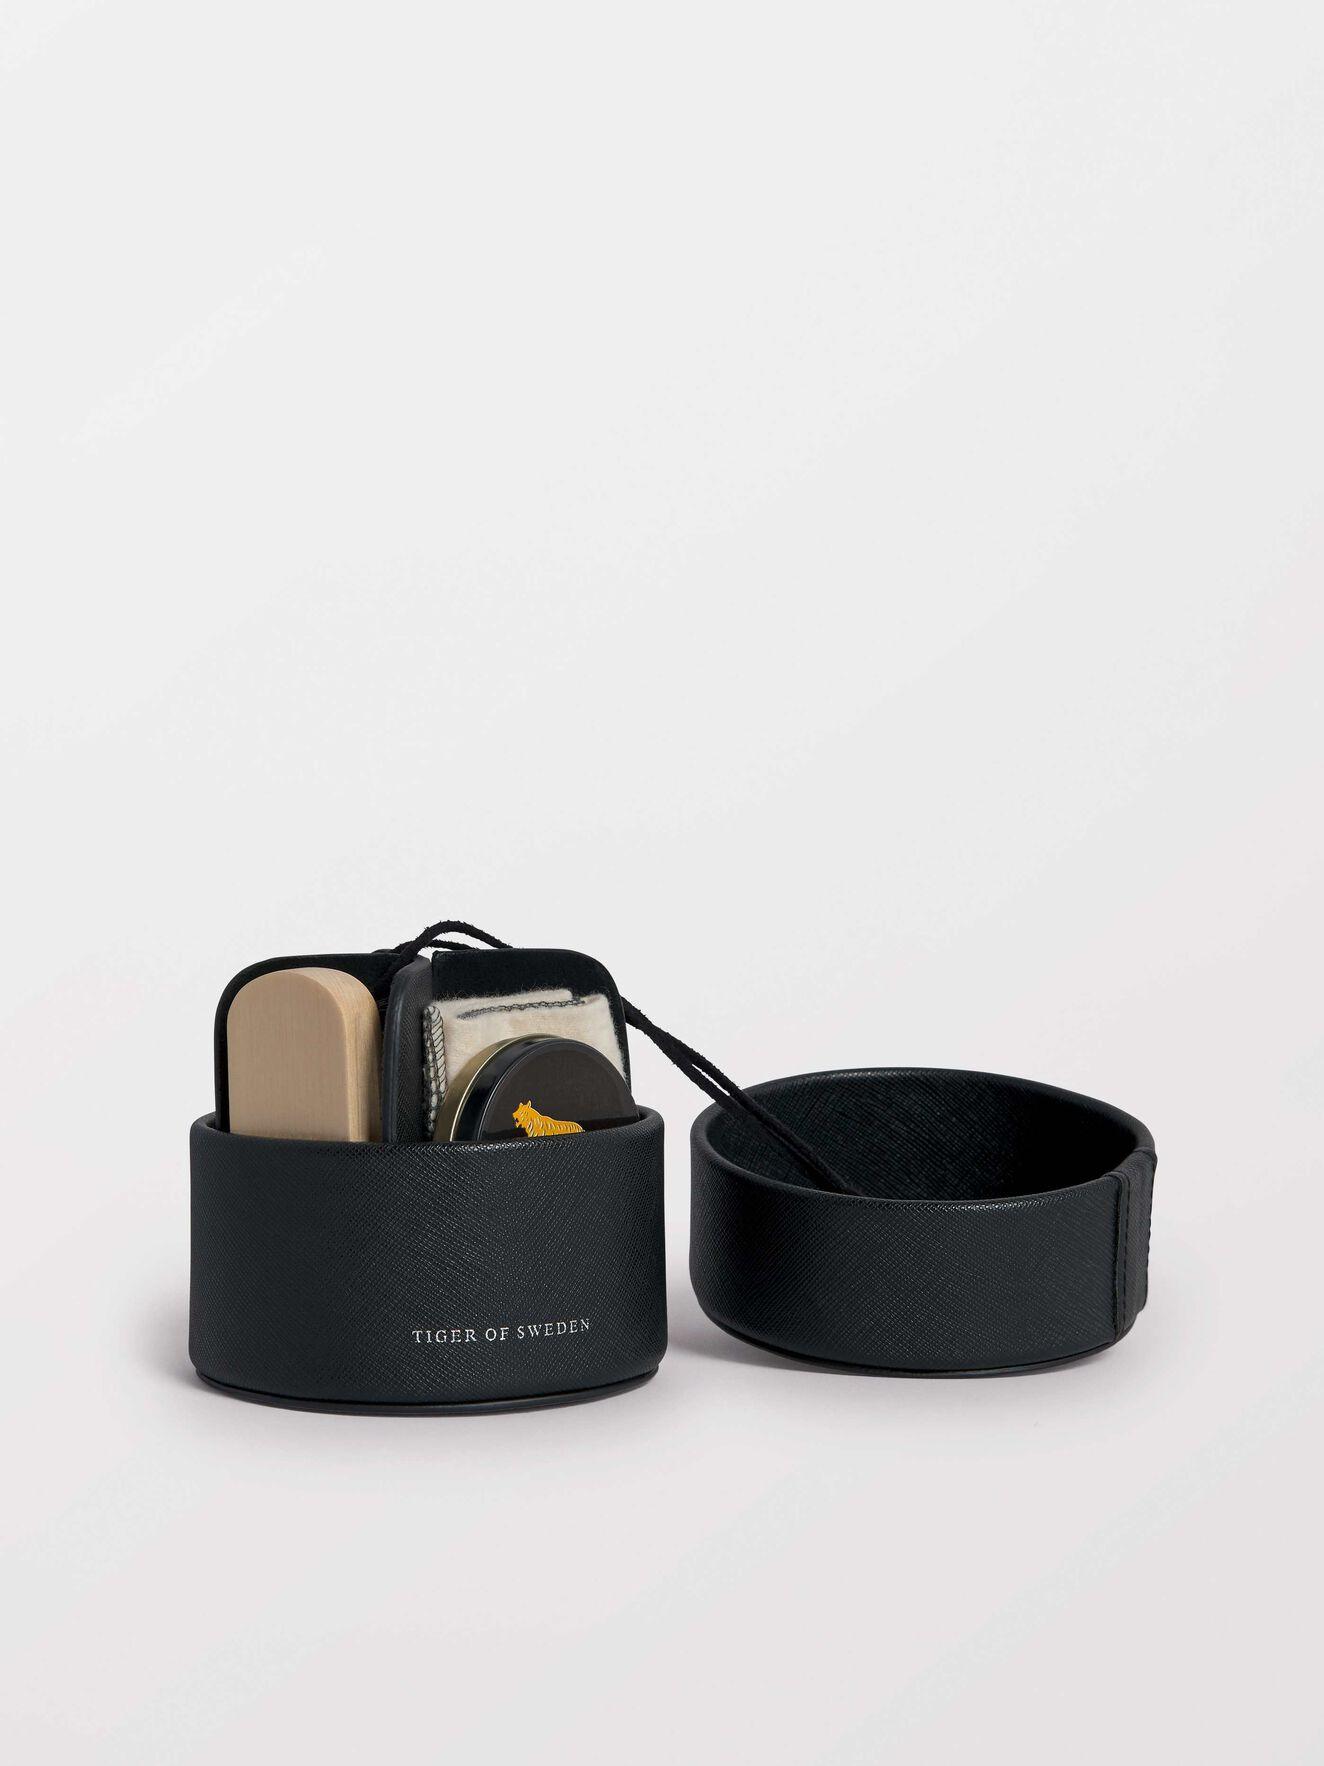 Shoe Shine Travel Kit  in Black from Tiger of Sweden